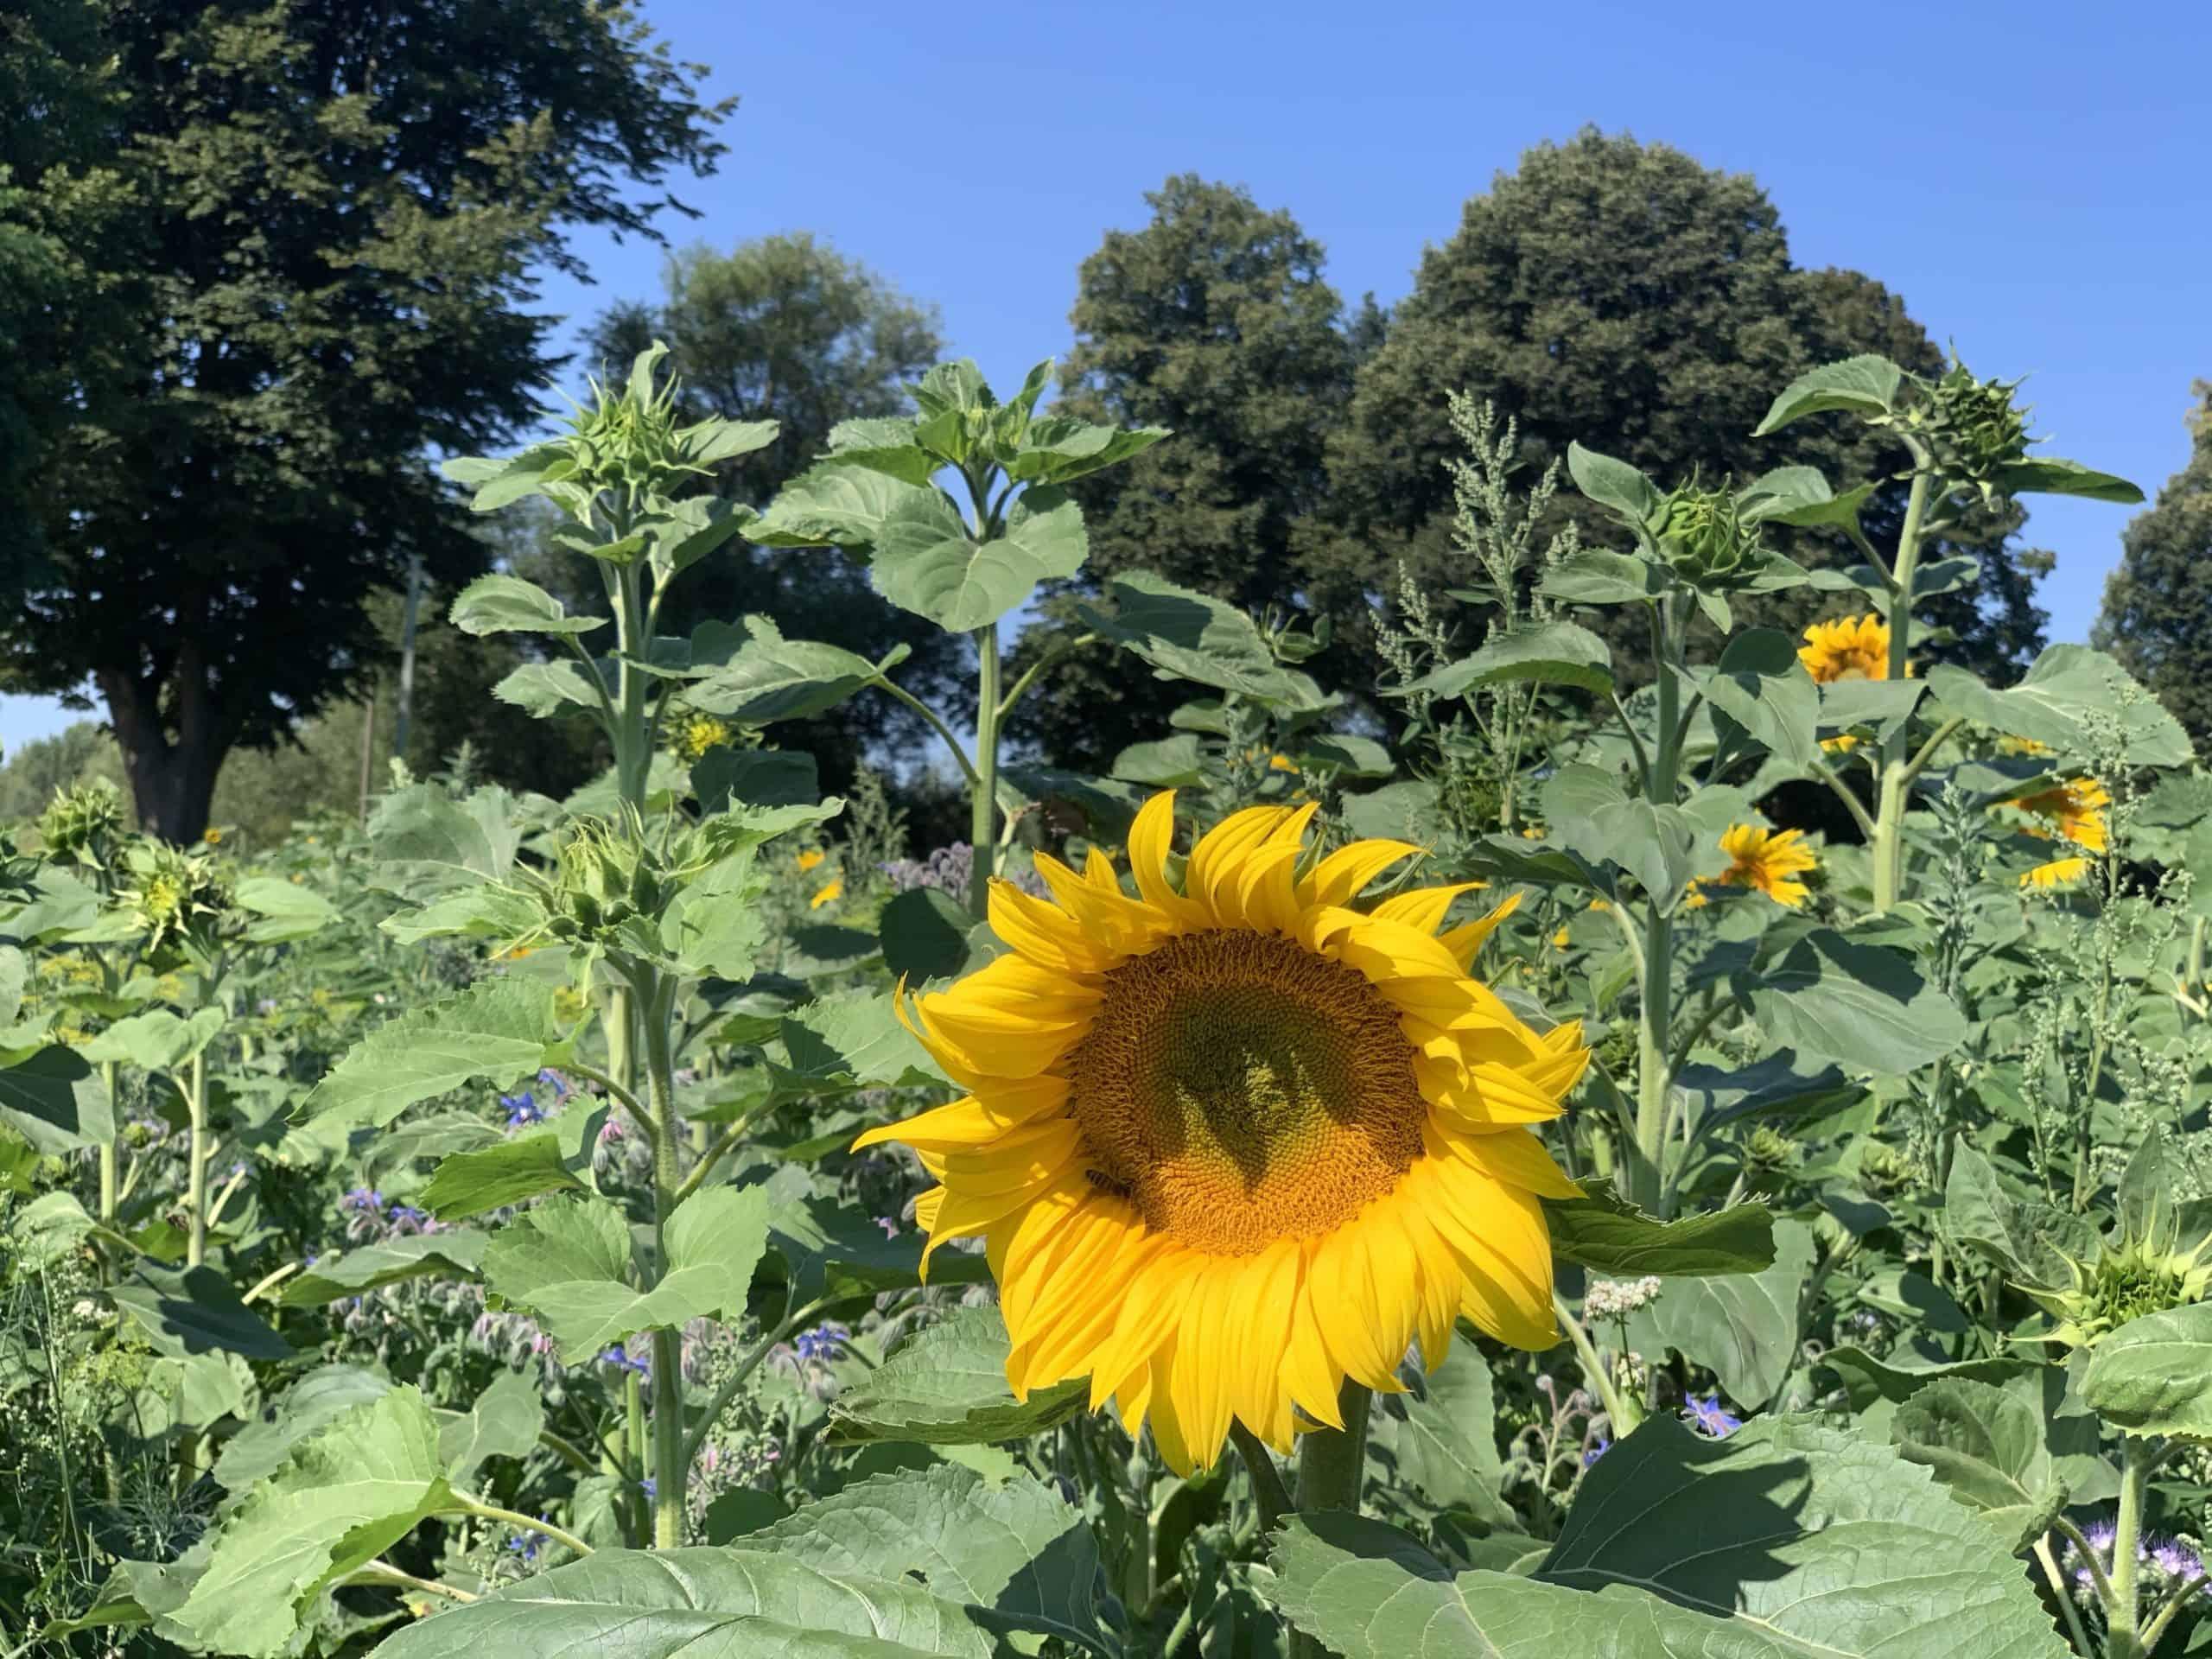 Sonnenblume Redder Straße 2020